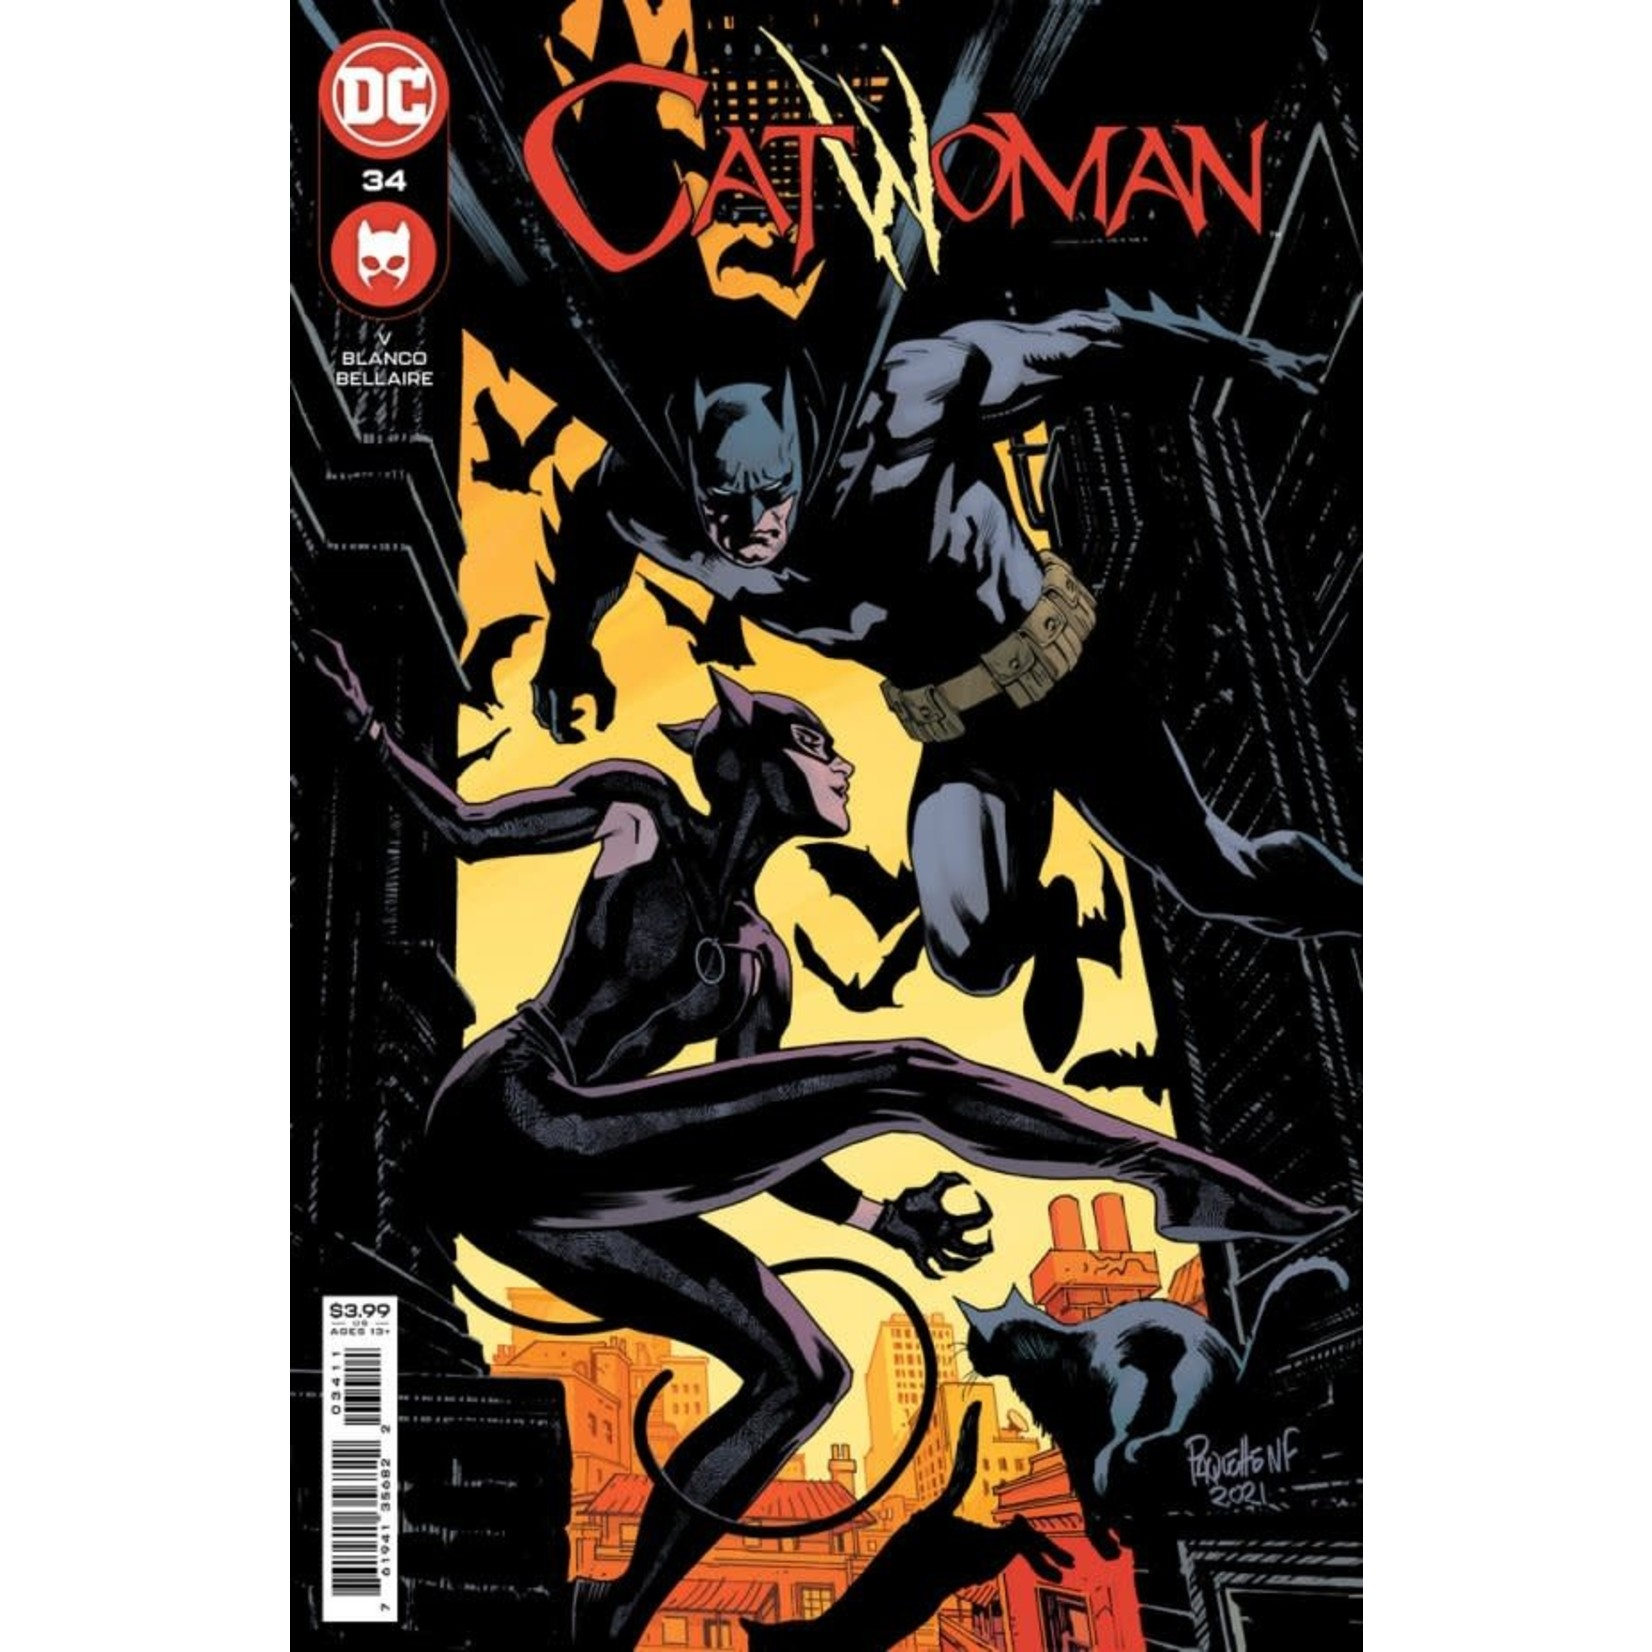 DC Comics Catwoman #34